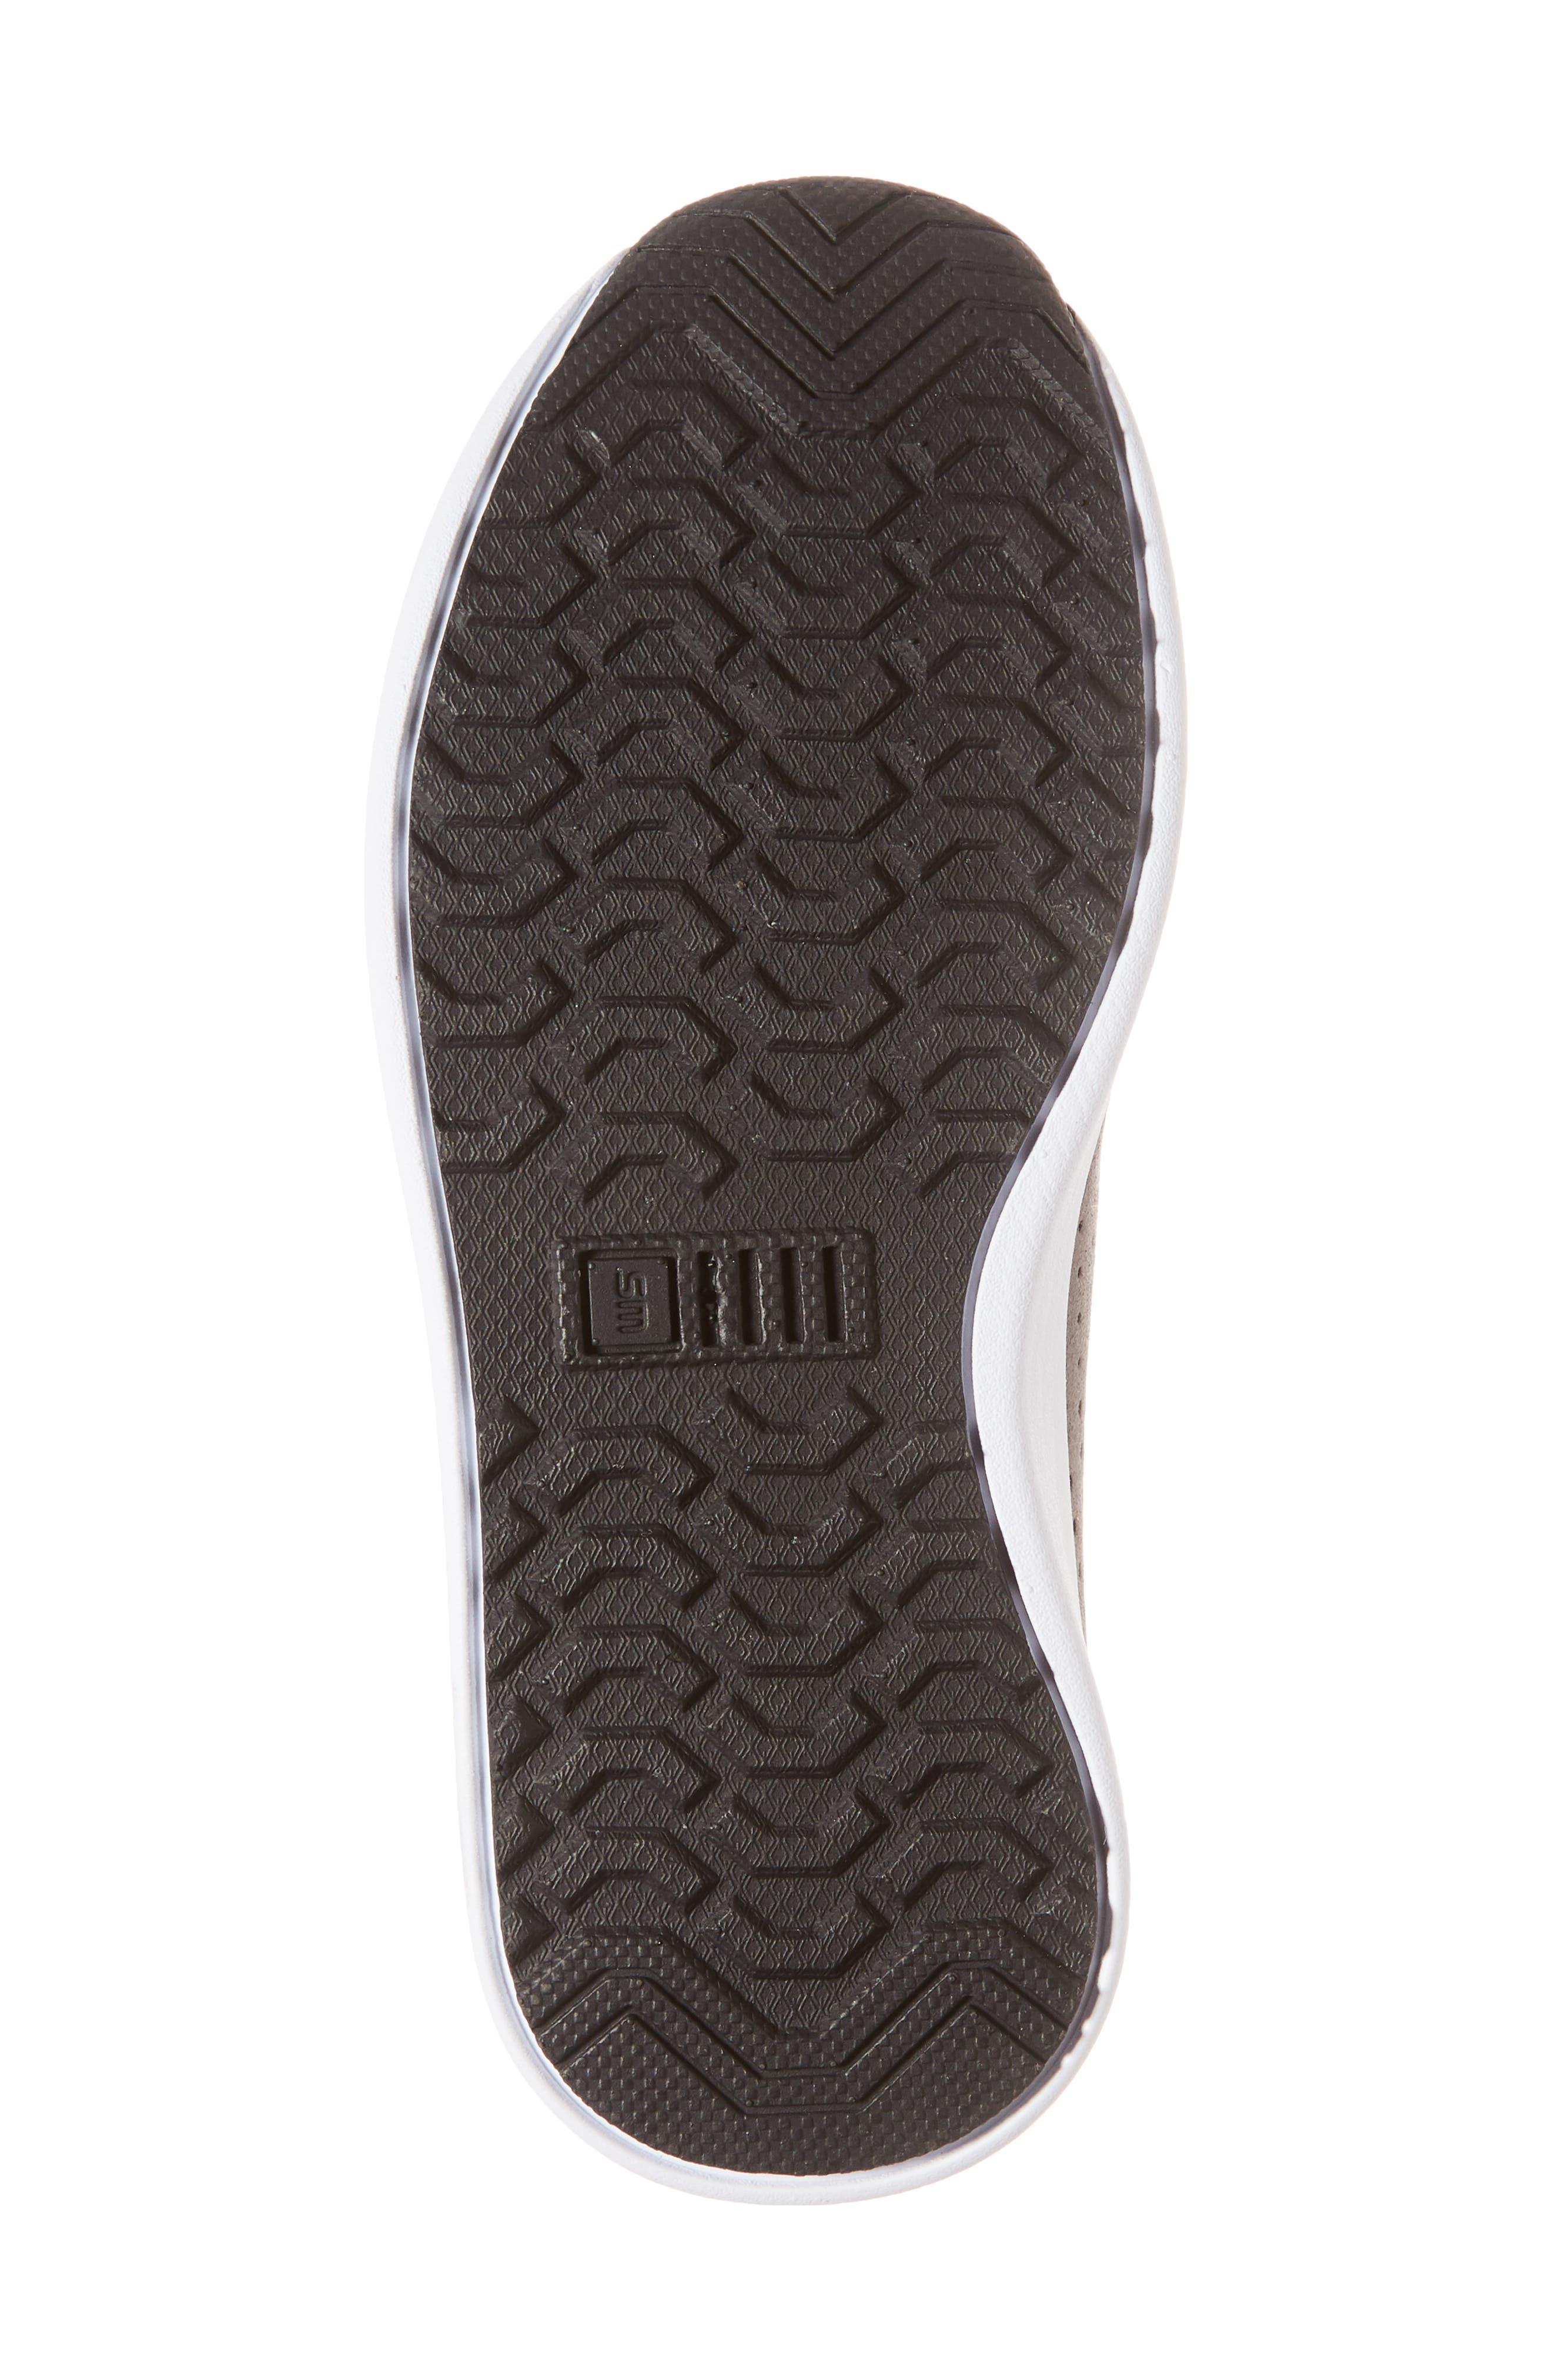 Brixxon Perforated Sneaker,                             Alternate thumbnail 6, color,                             Grey